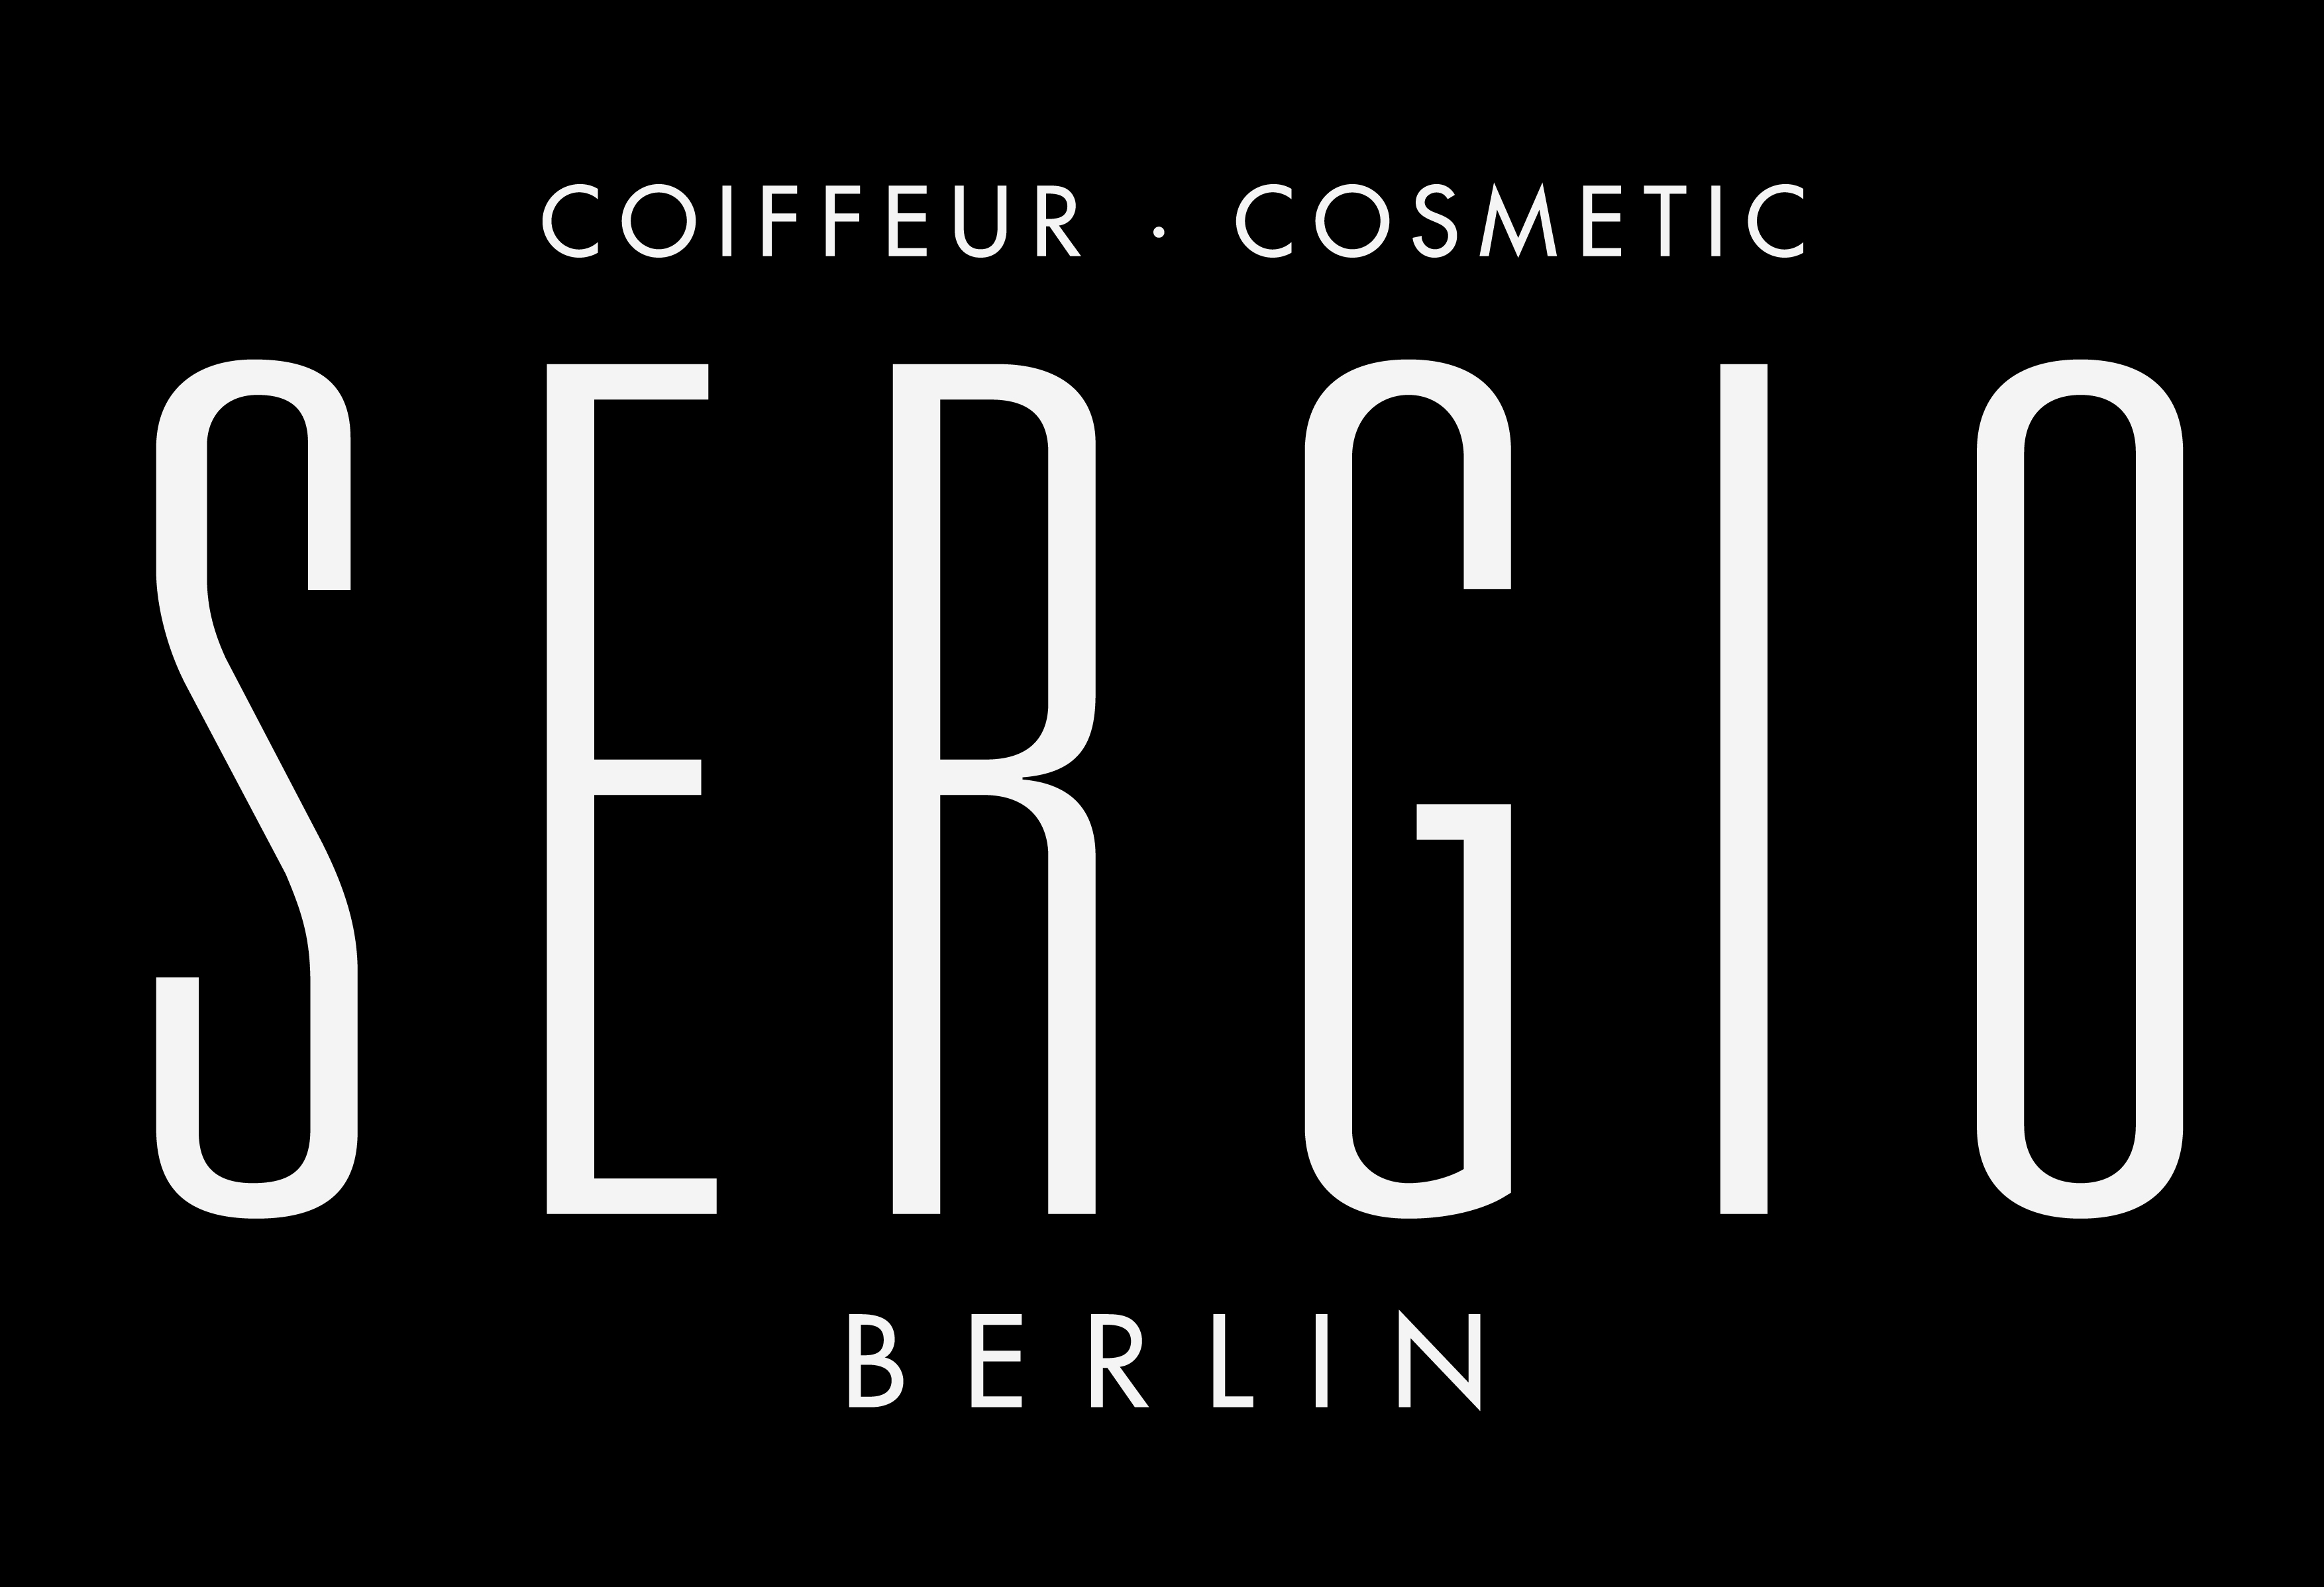 Coiffeur Sergio Logo